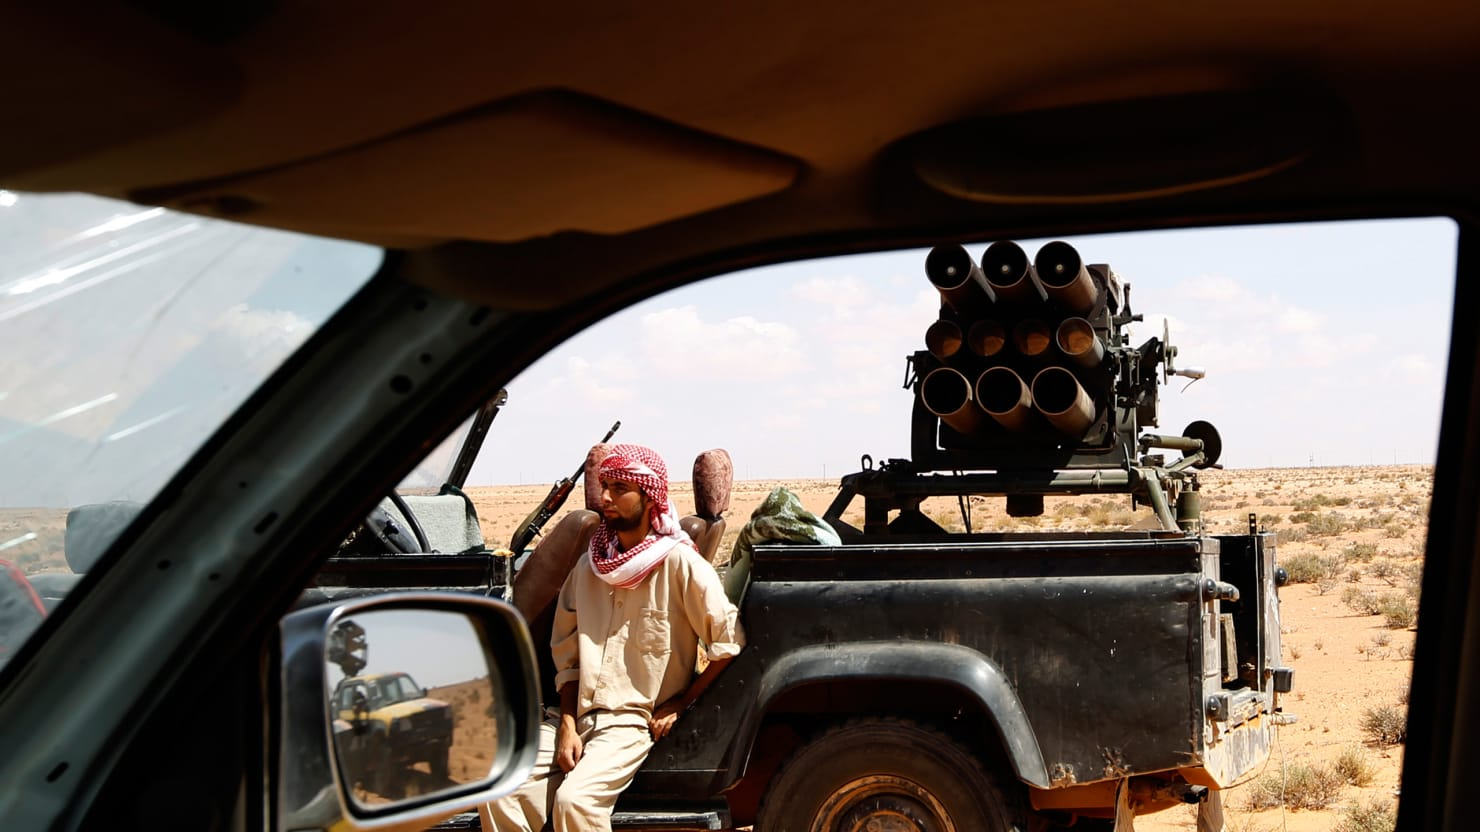 Jihadists Now Control Secretive U.S. Base in Libya